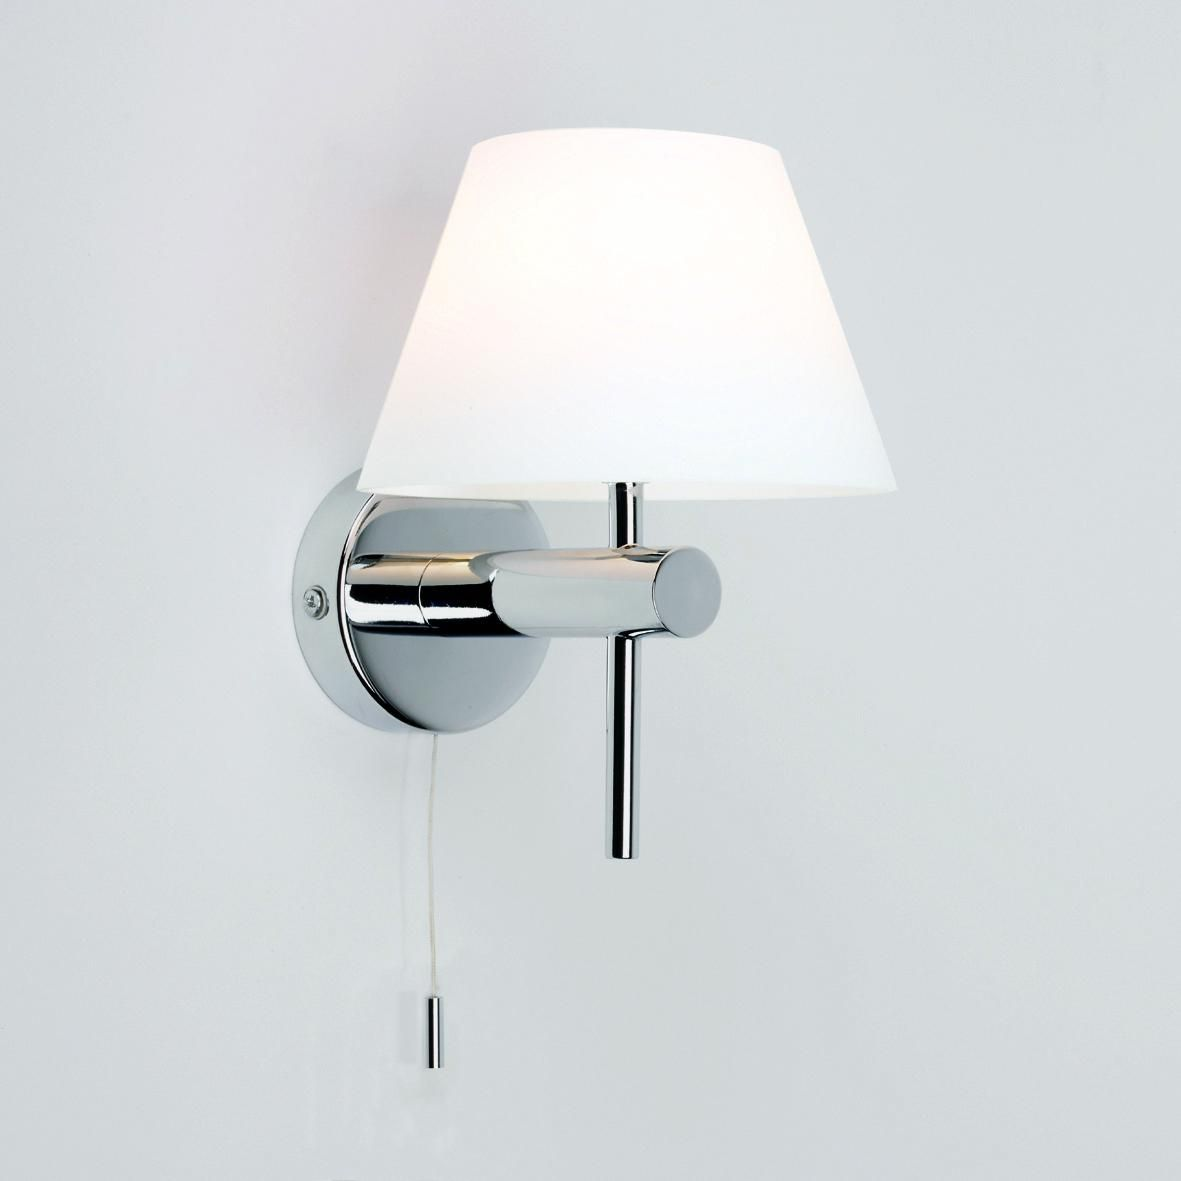 Bathroom Safe Wall Light With Glass Shade Pullcord Wall Lights